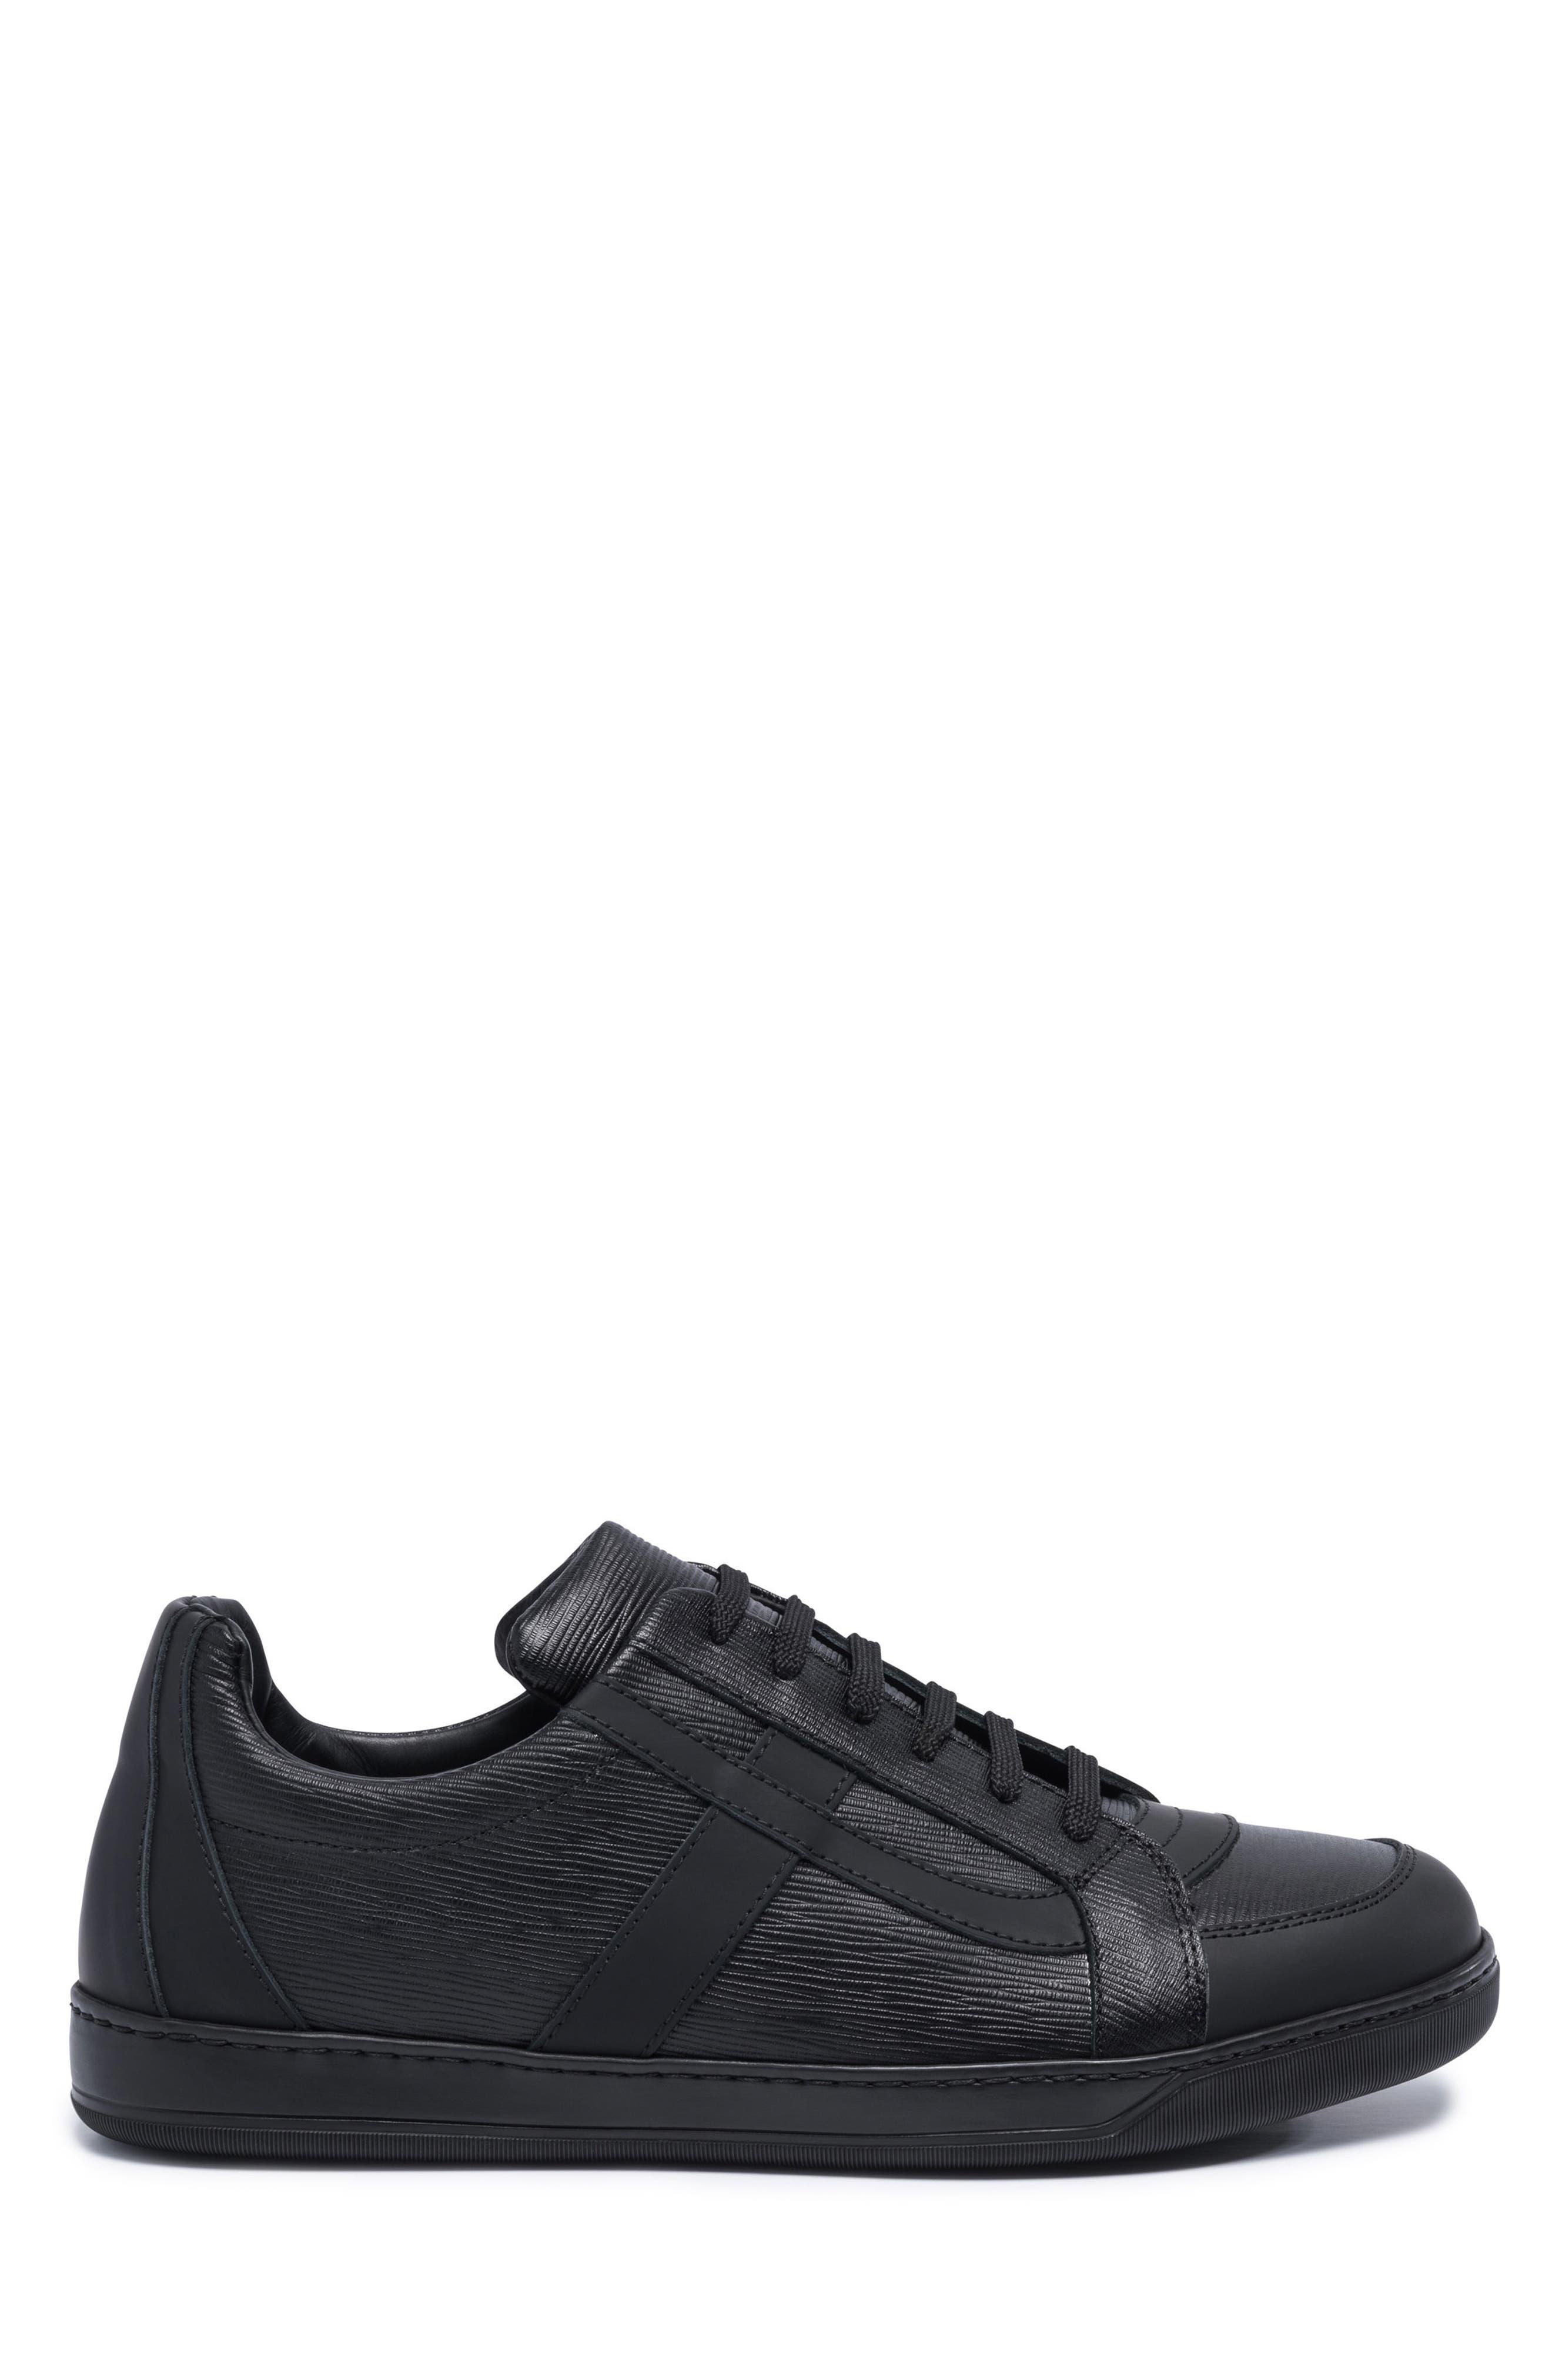 Novecento Sneaker,                             Alternate thumbnail 3, color,                             Navy Leather